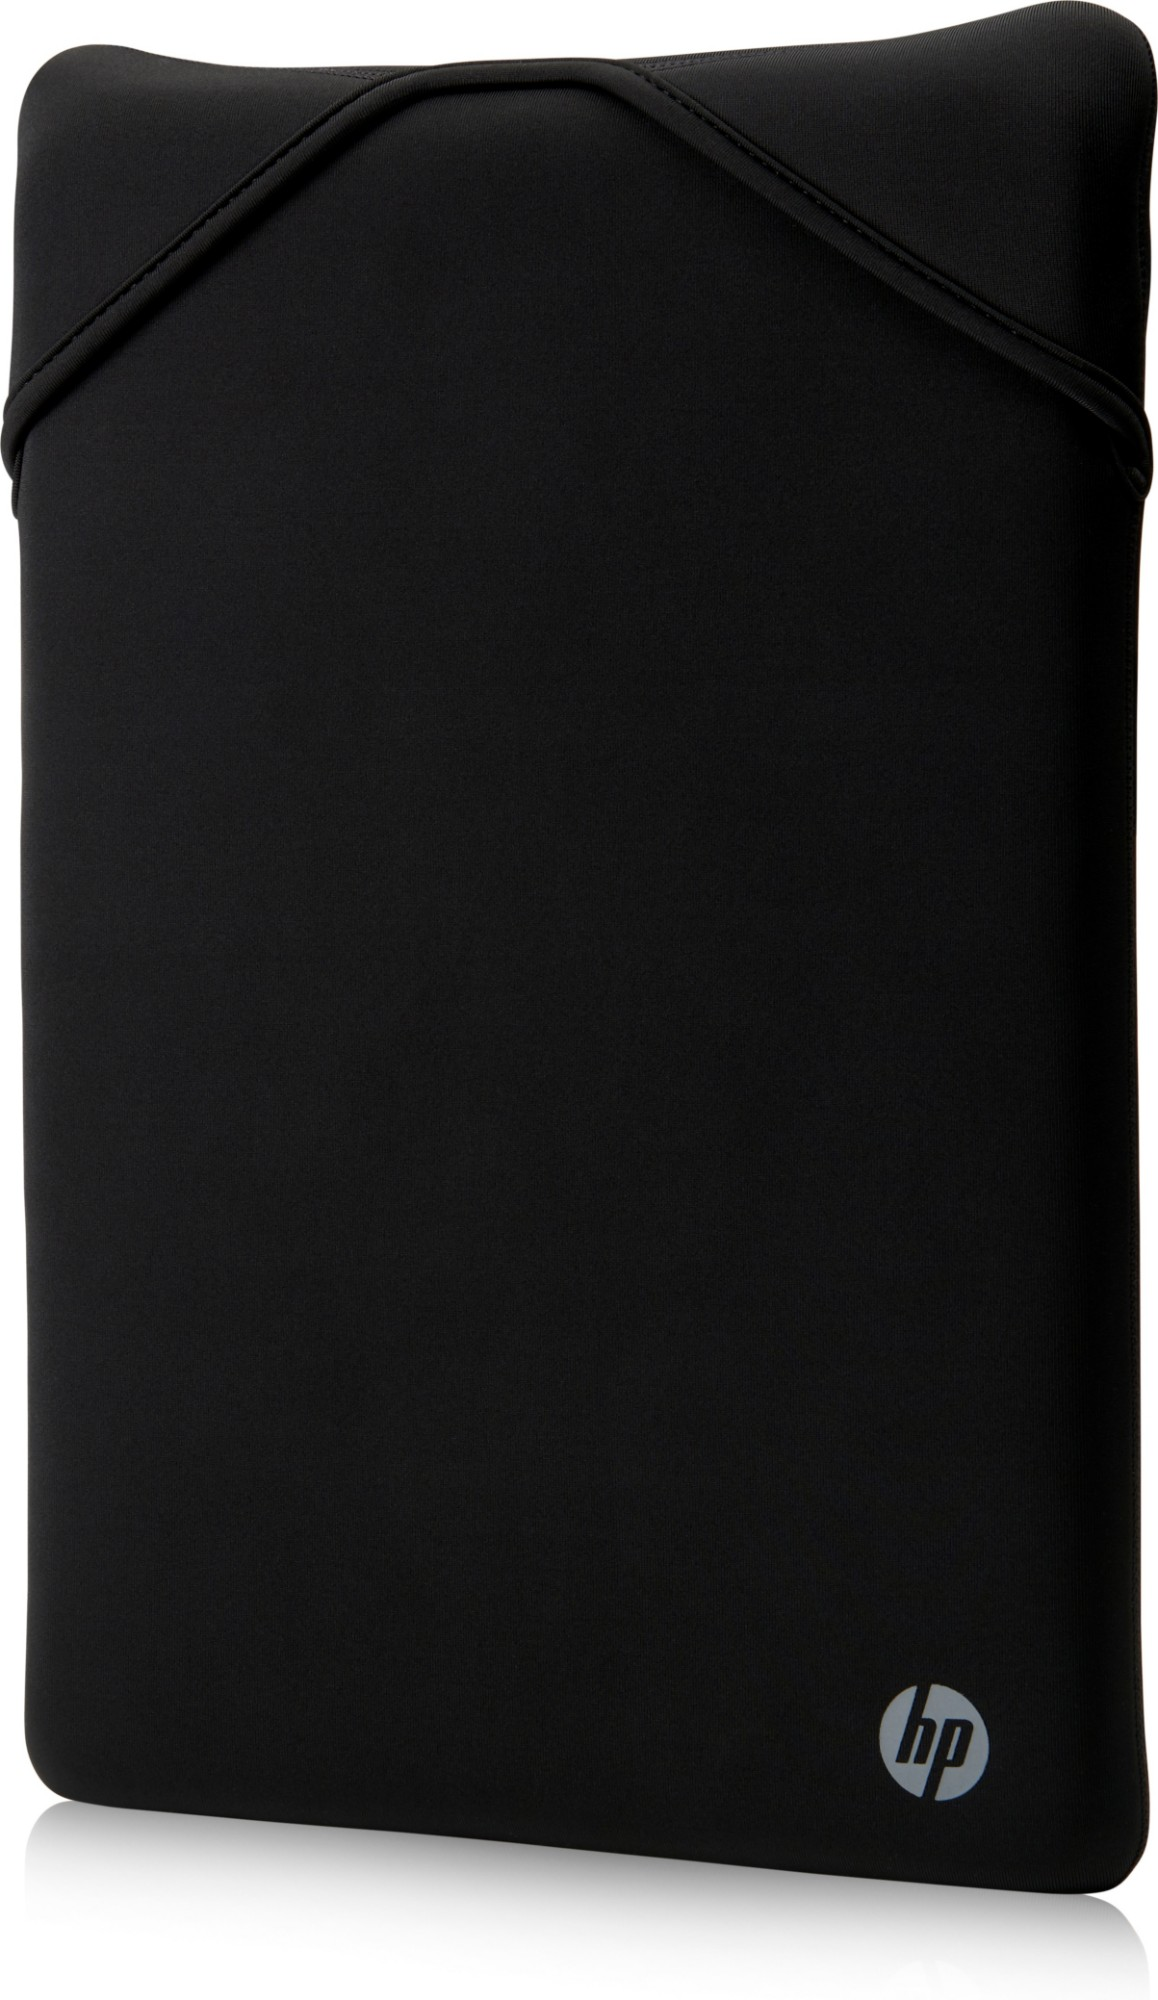 "HP 7ZE82AA maletines para portátil 33,8 cm (13.3"") Funda Negro"